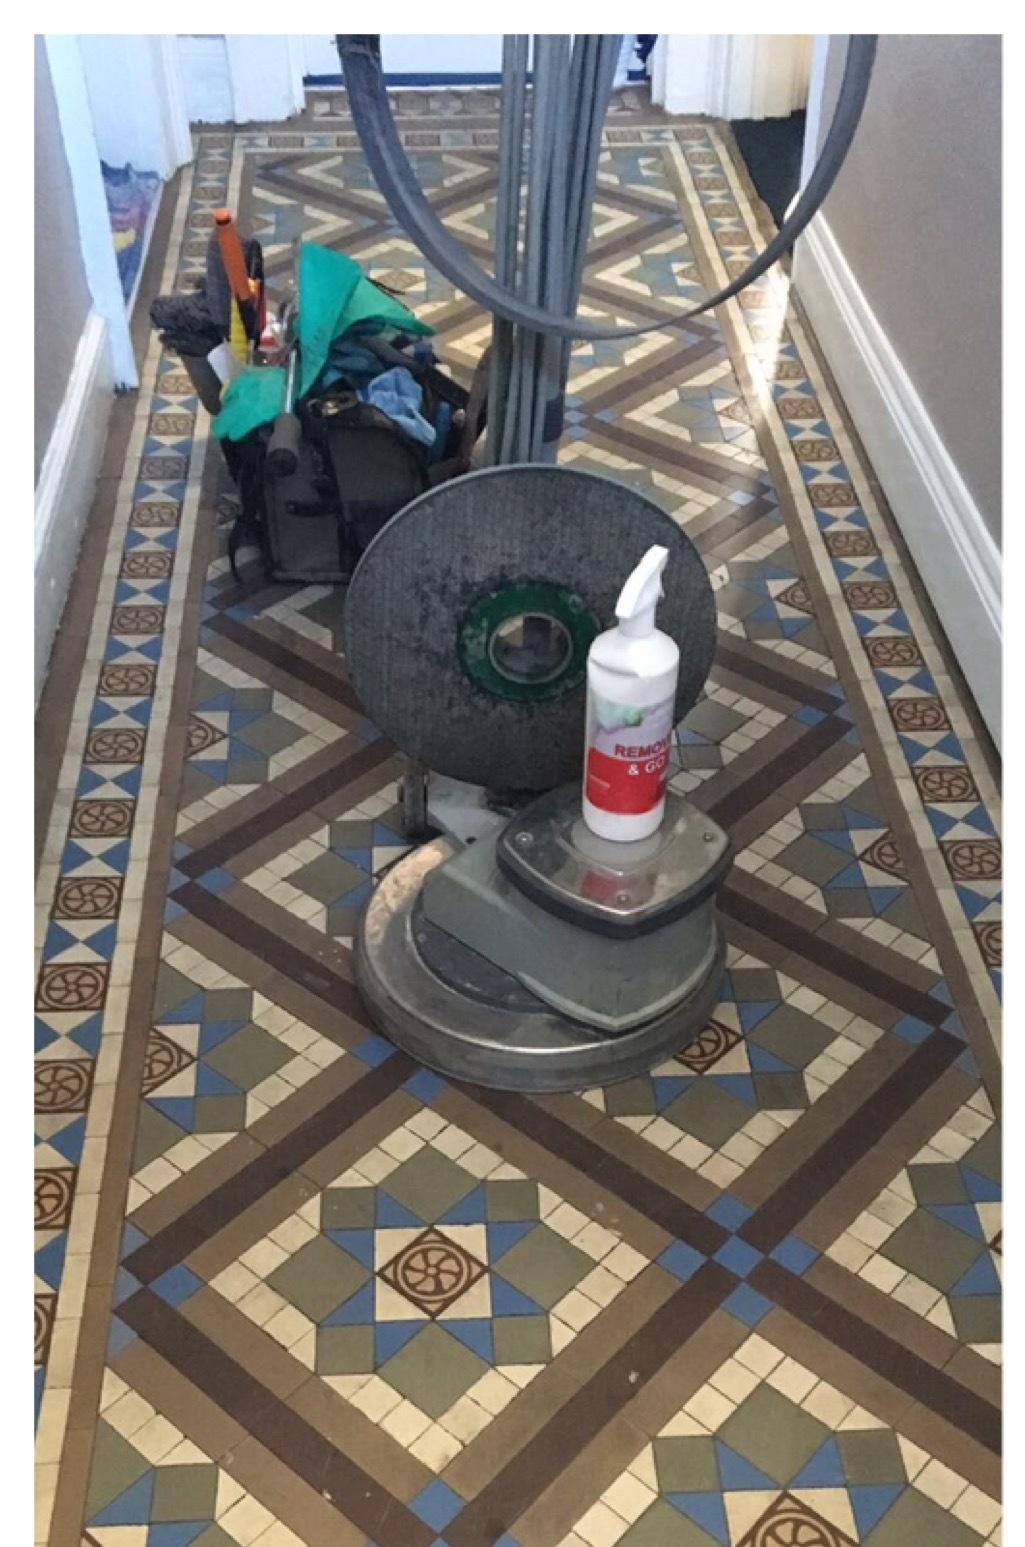 Edwardian Geometric Tiled Hallway Floor Newark Before Cleaning